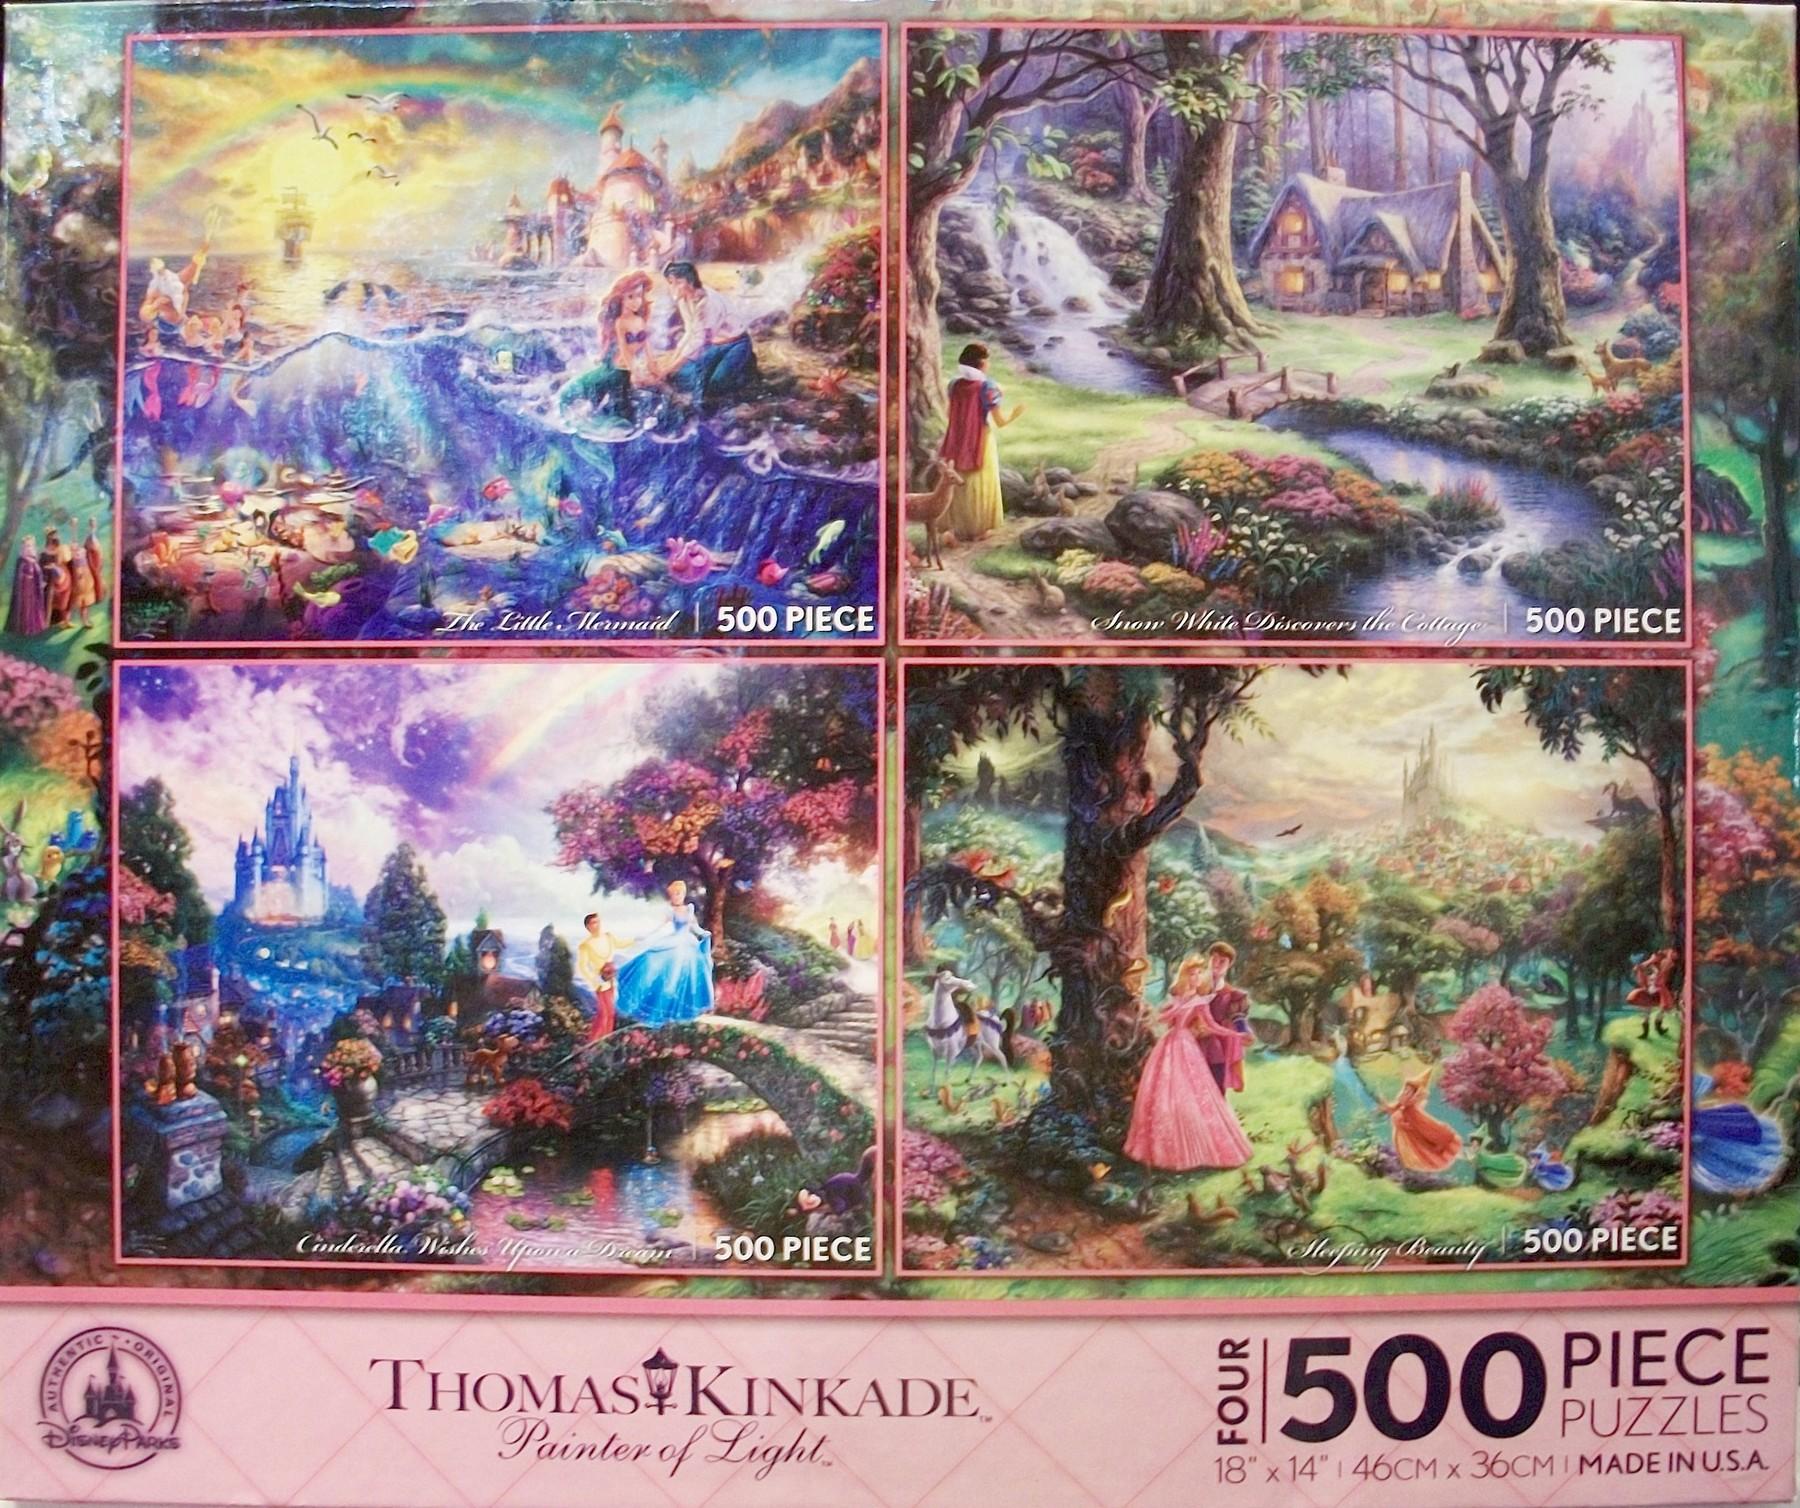 2013 Fall Disney World Four 500 Piece Jigsaw Puzzles